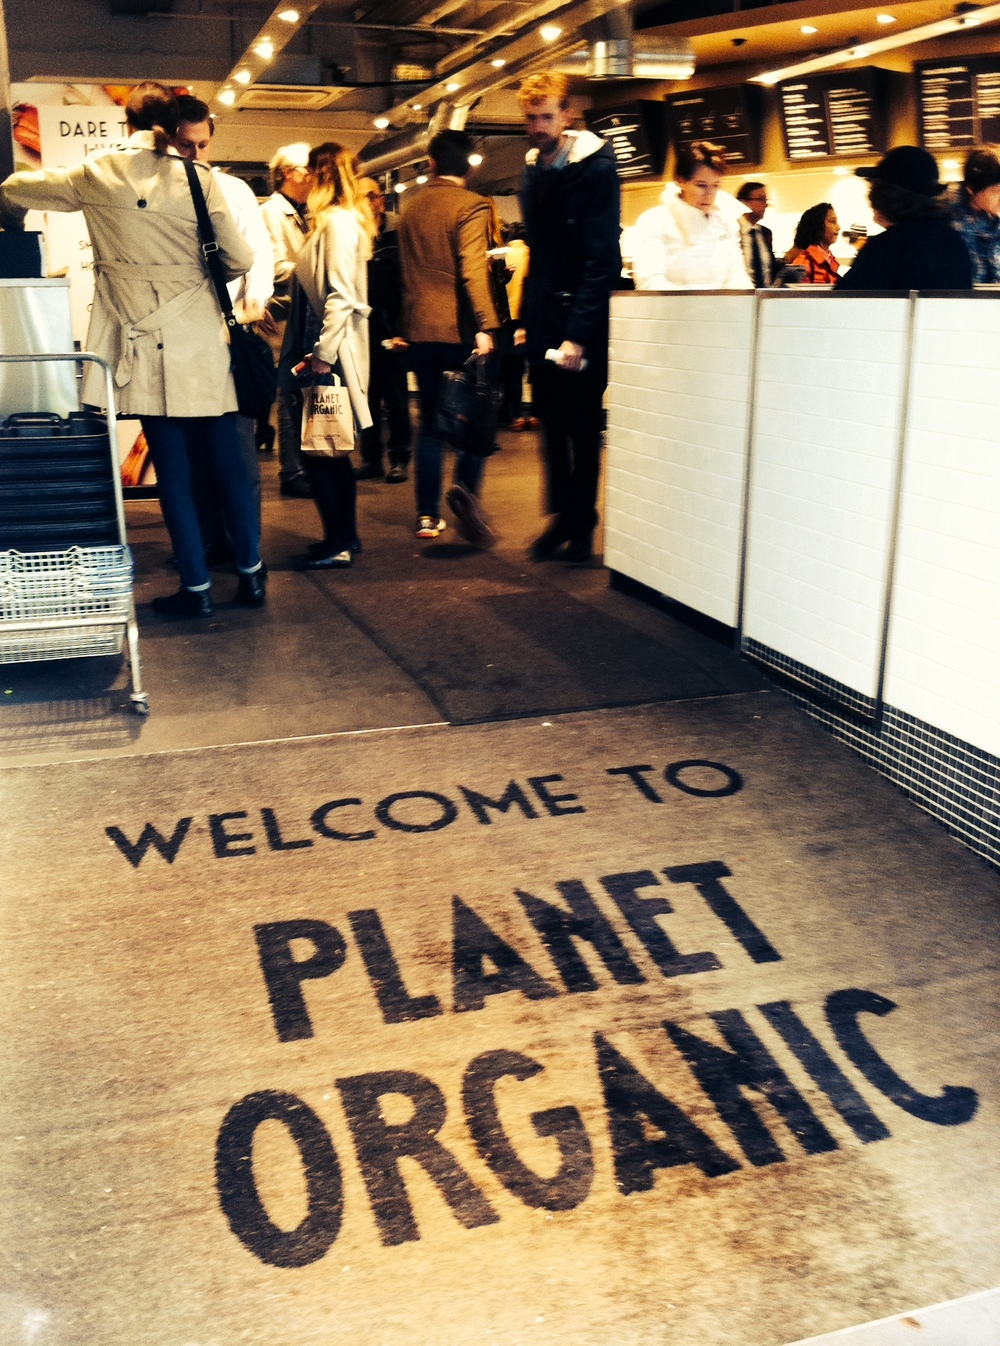 Planet Organic 입구.jpeg